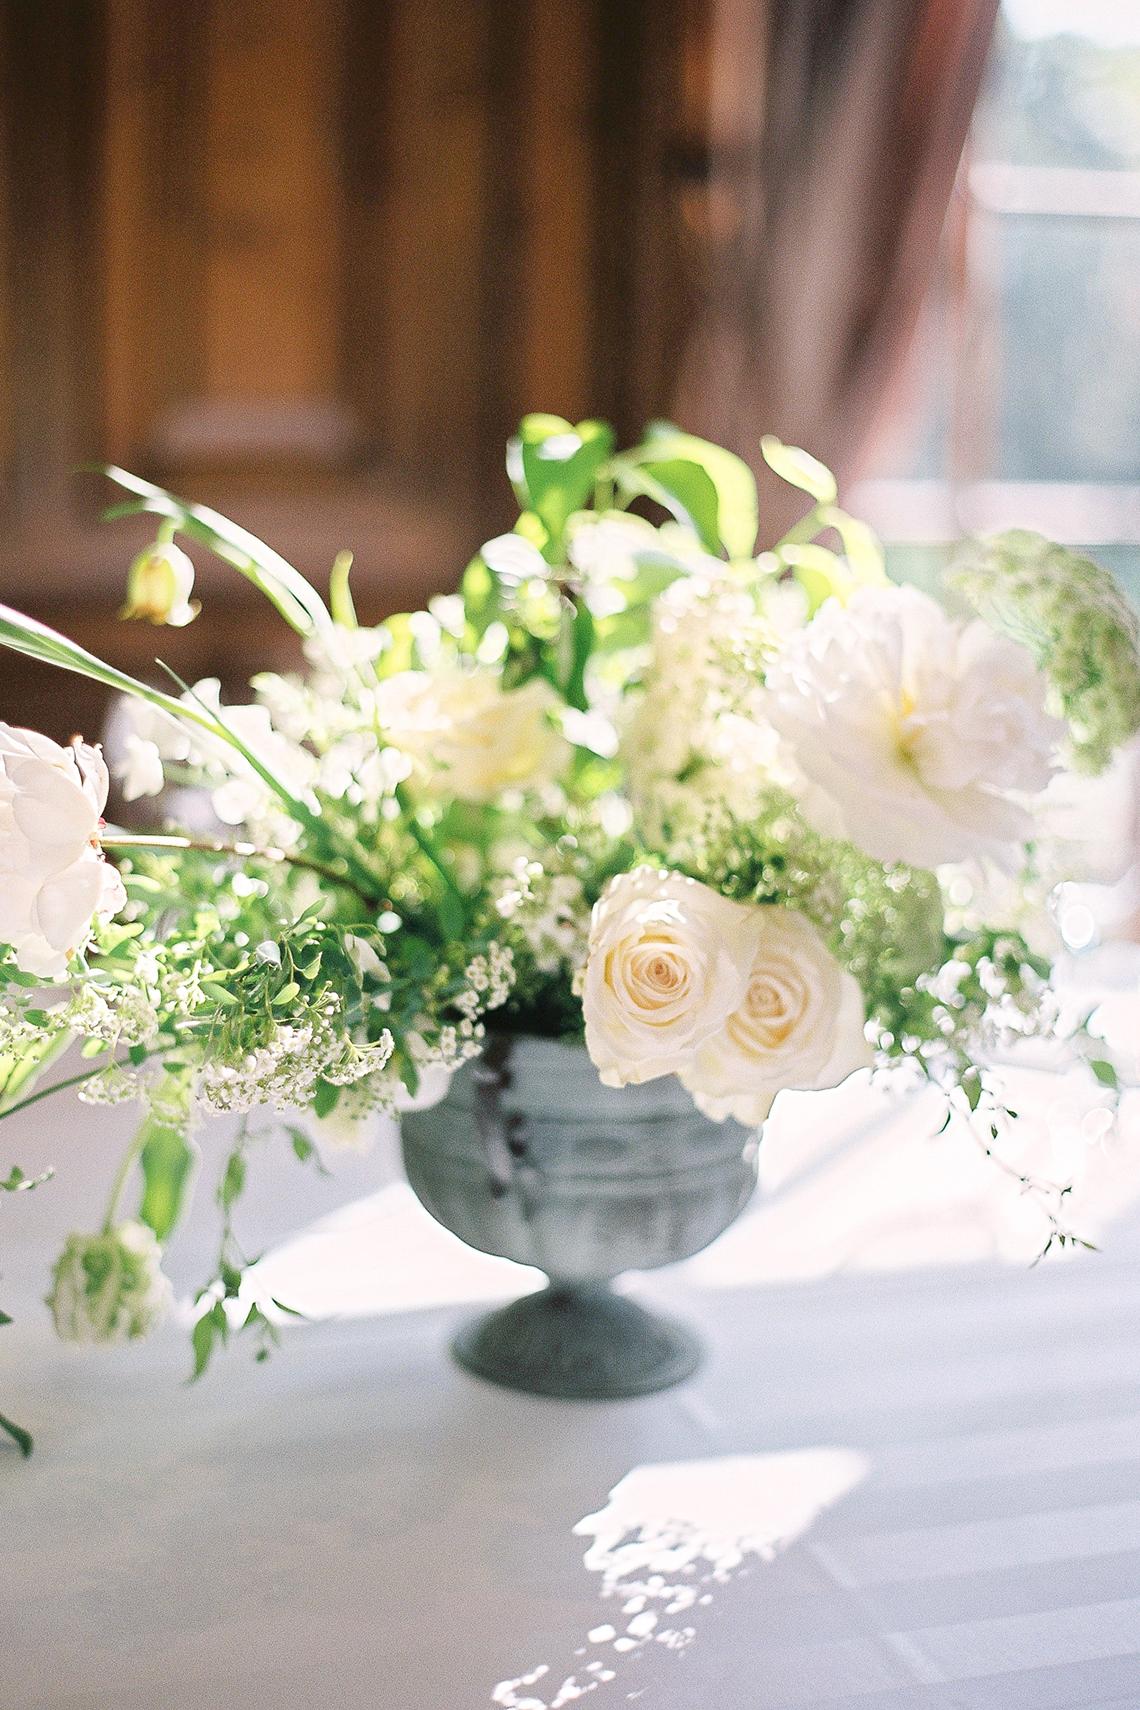 Hedsor House Wedding Photographer Julie Michaelsen Photography